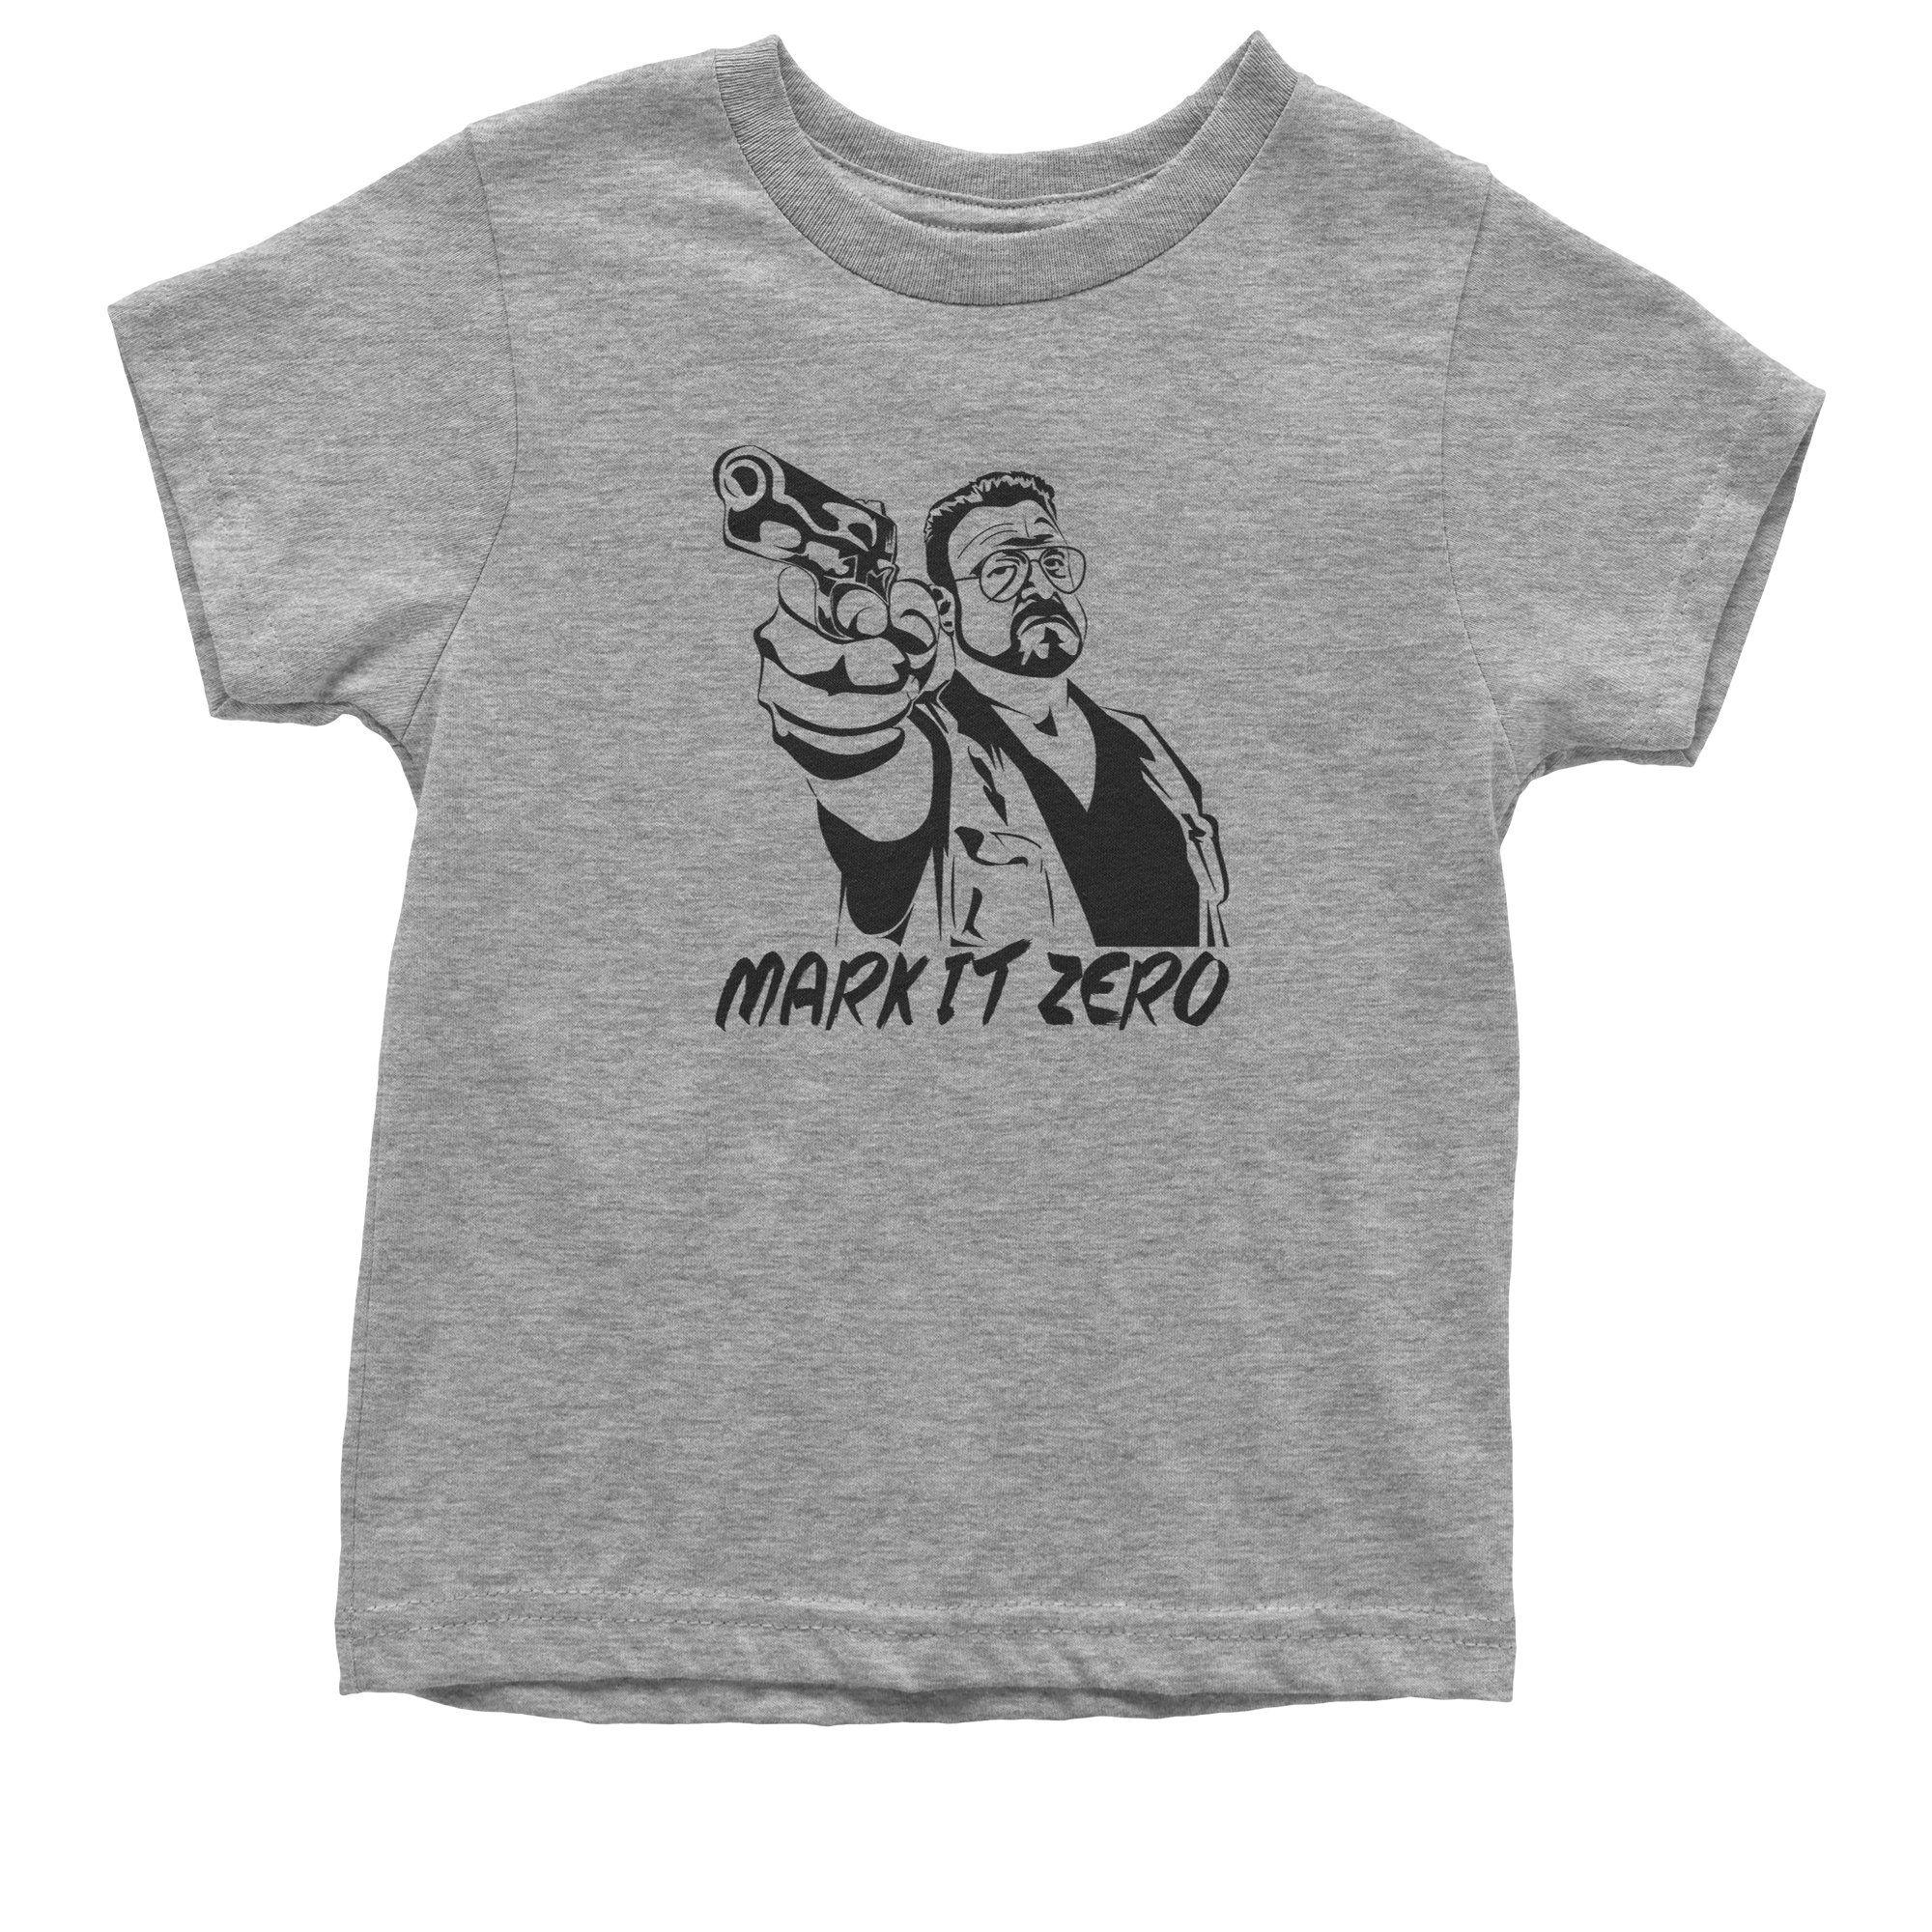 Mark It Zero Youth T-shirt